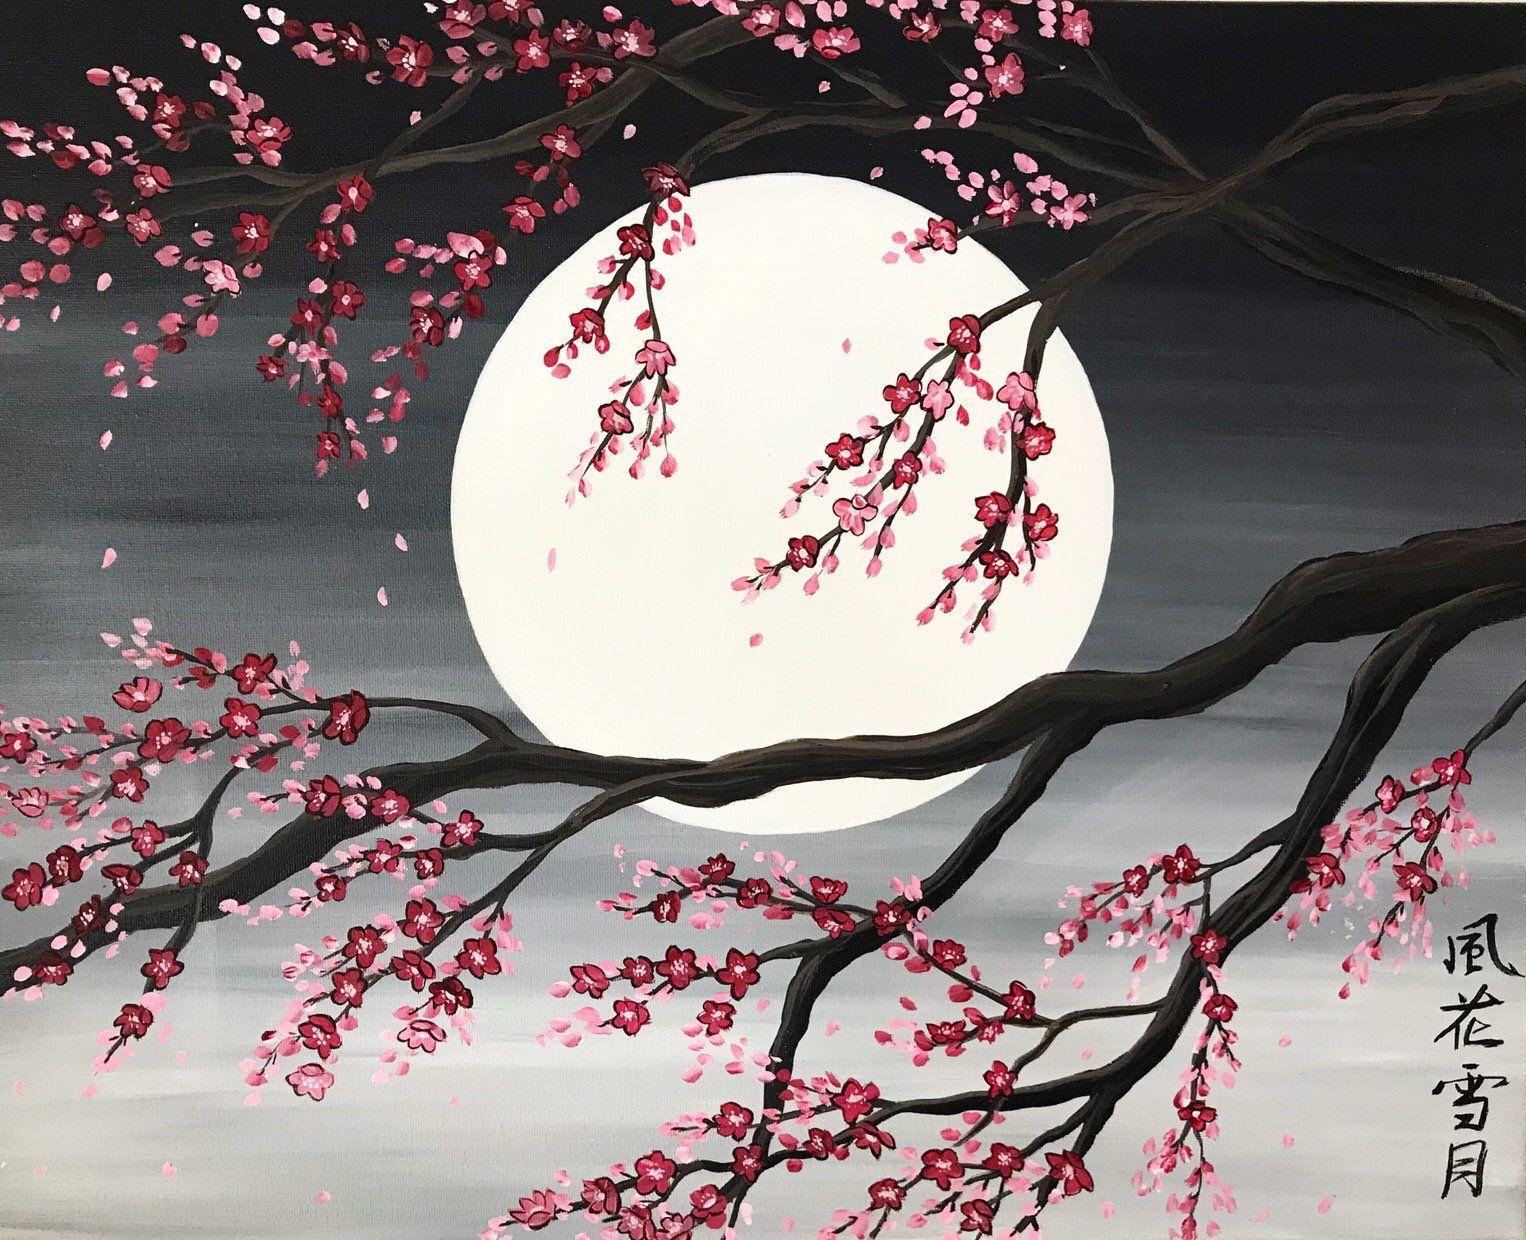 Excited To Share This Item From My Etsy Shop Sakura Painting Cherry Blossom Tree Sakura Painting Cherry Blossom Painting Acrylic Cherry Blossom Painting